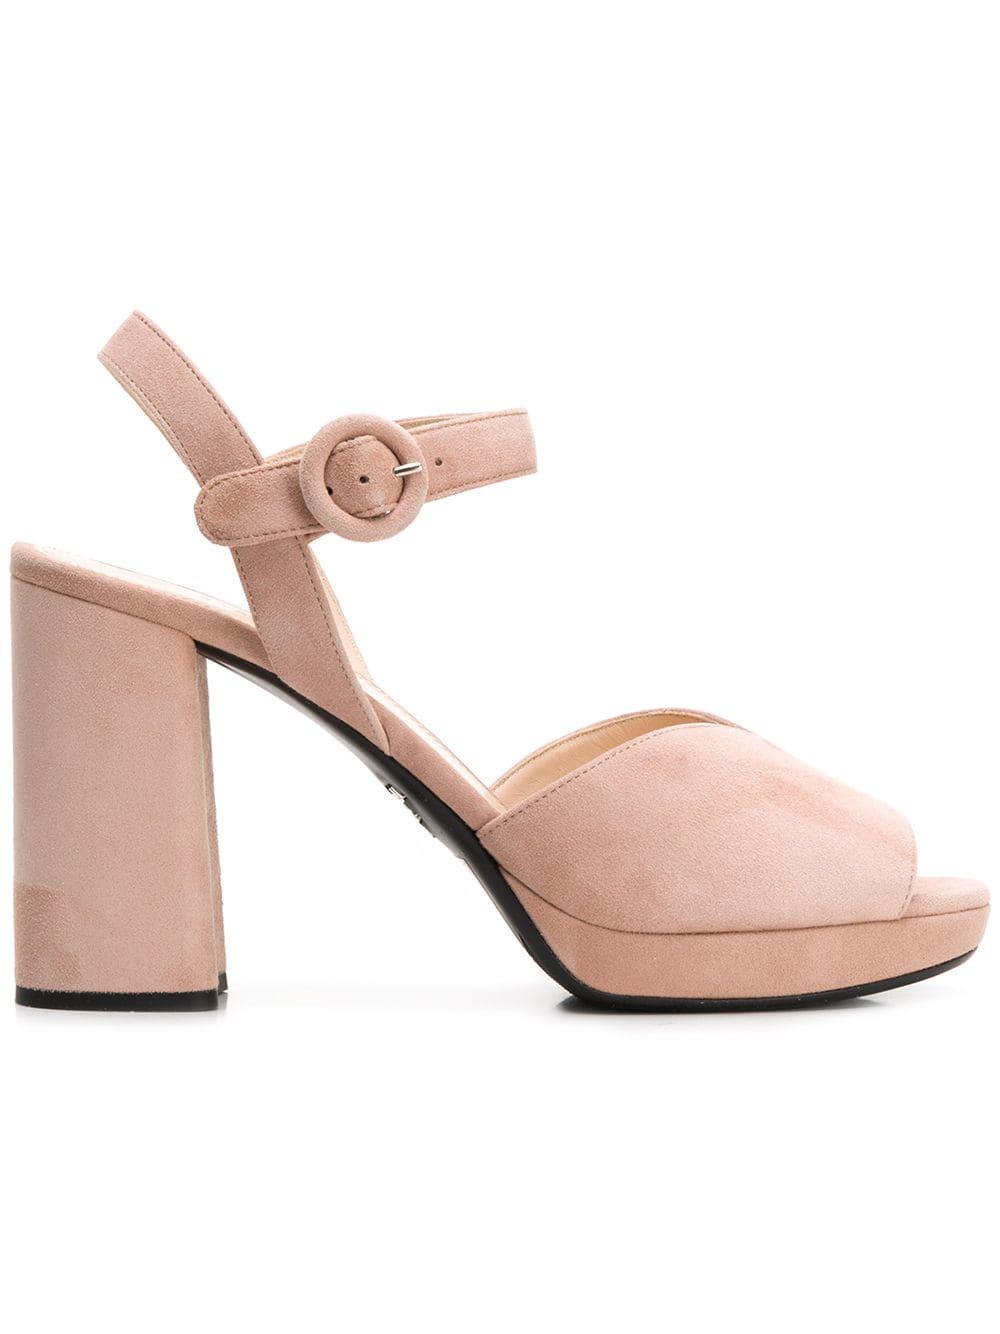 cb050ed8928e Prada Chunky Heel Sandals - Pink